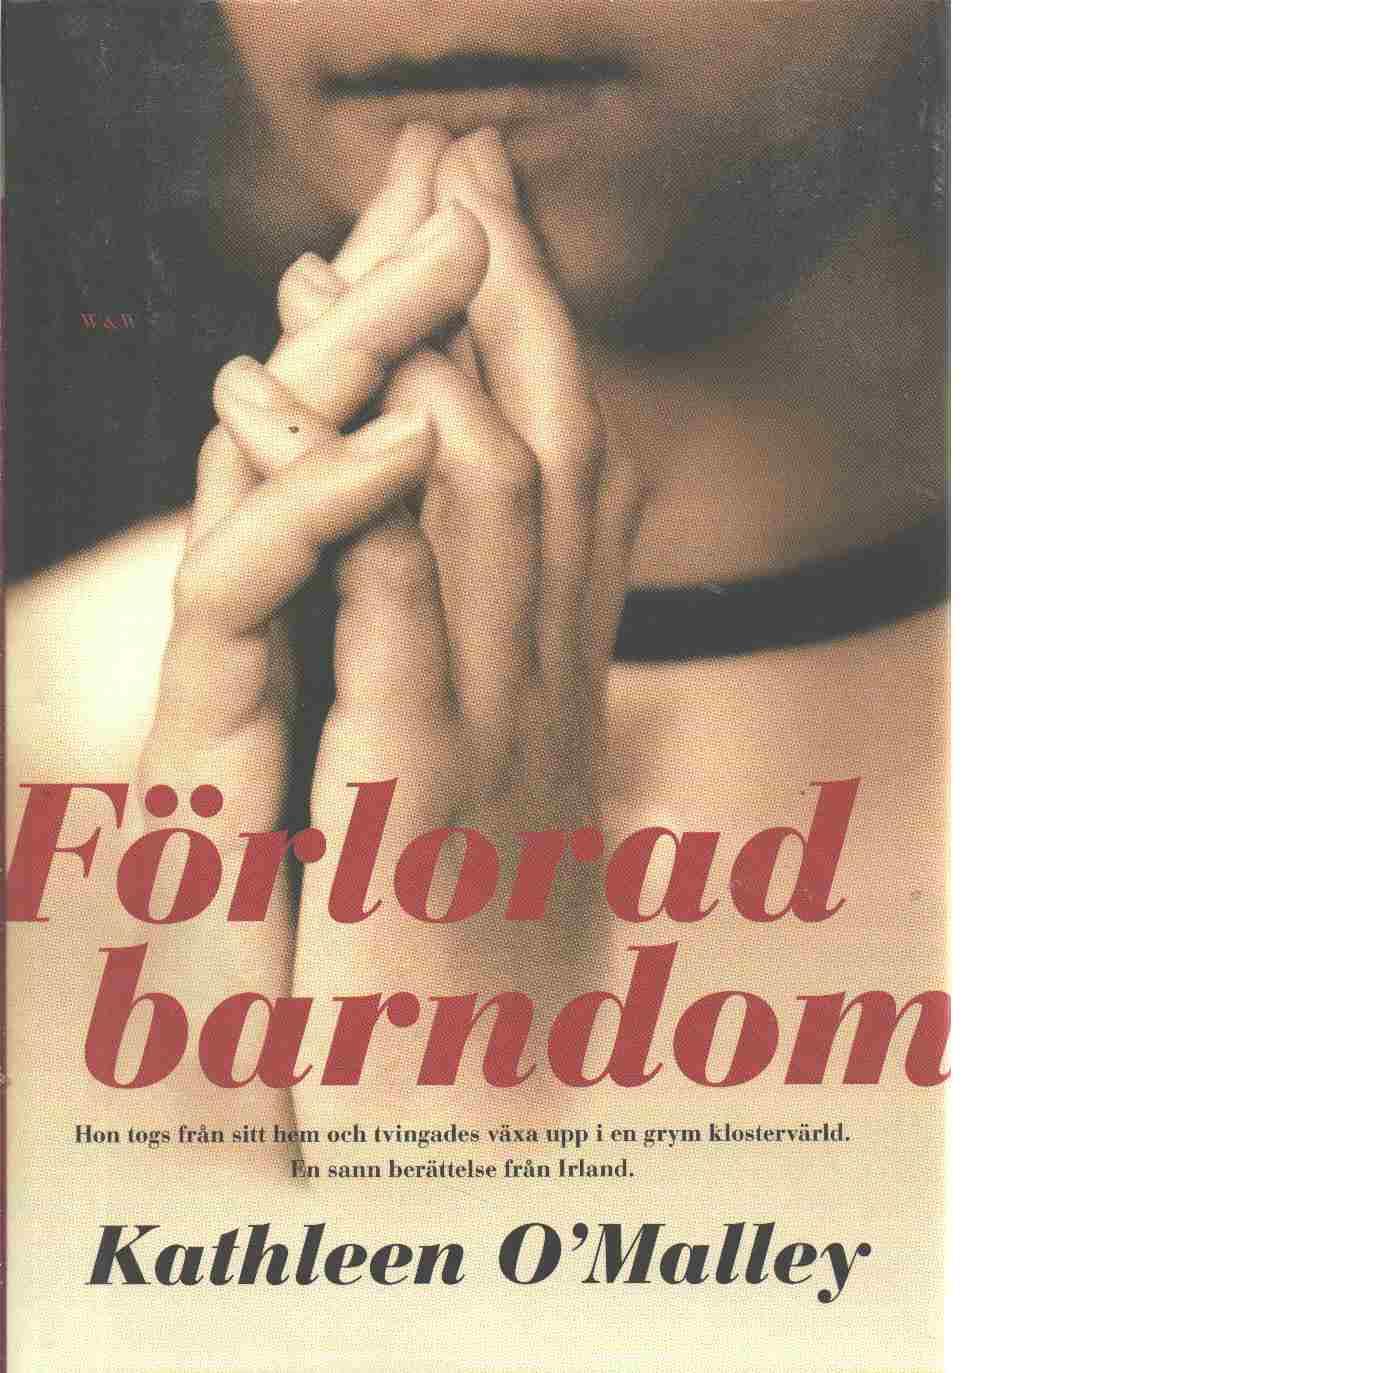 Förlorad barndom - O'Malley, Kathleen